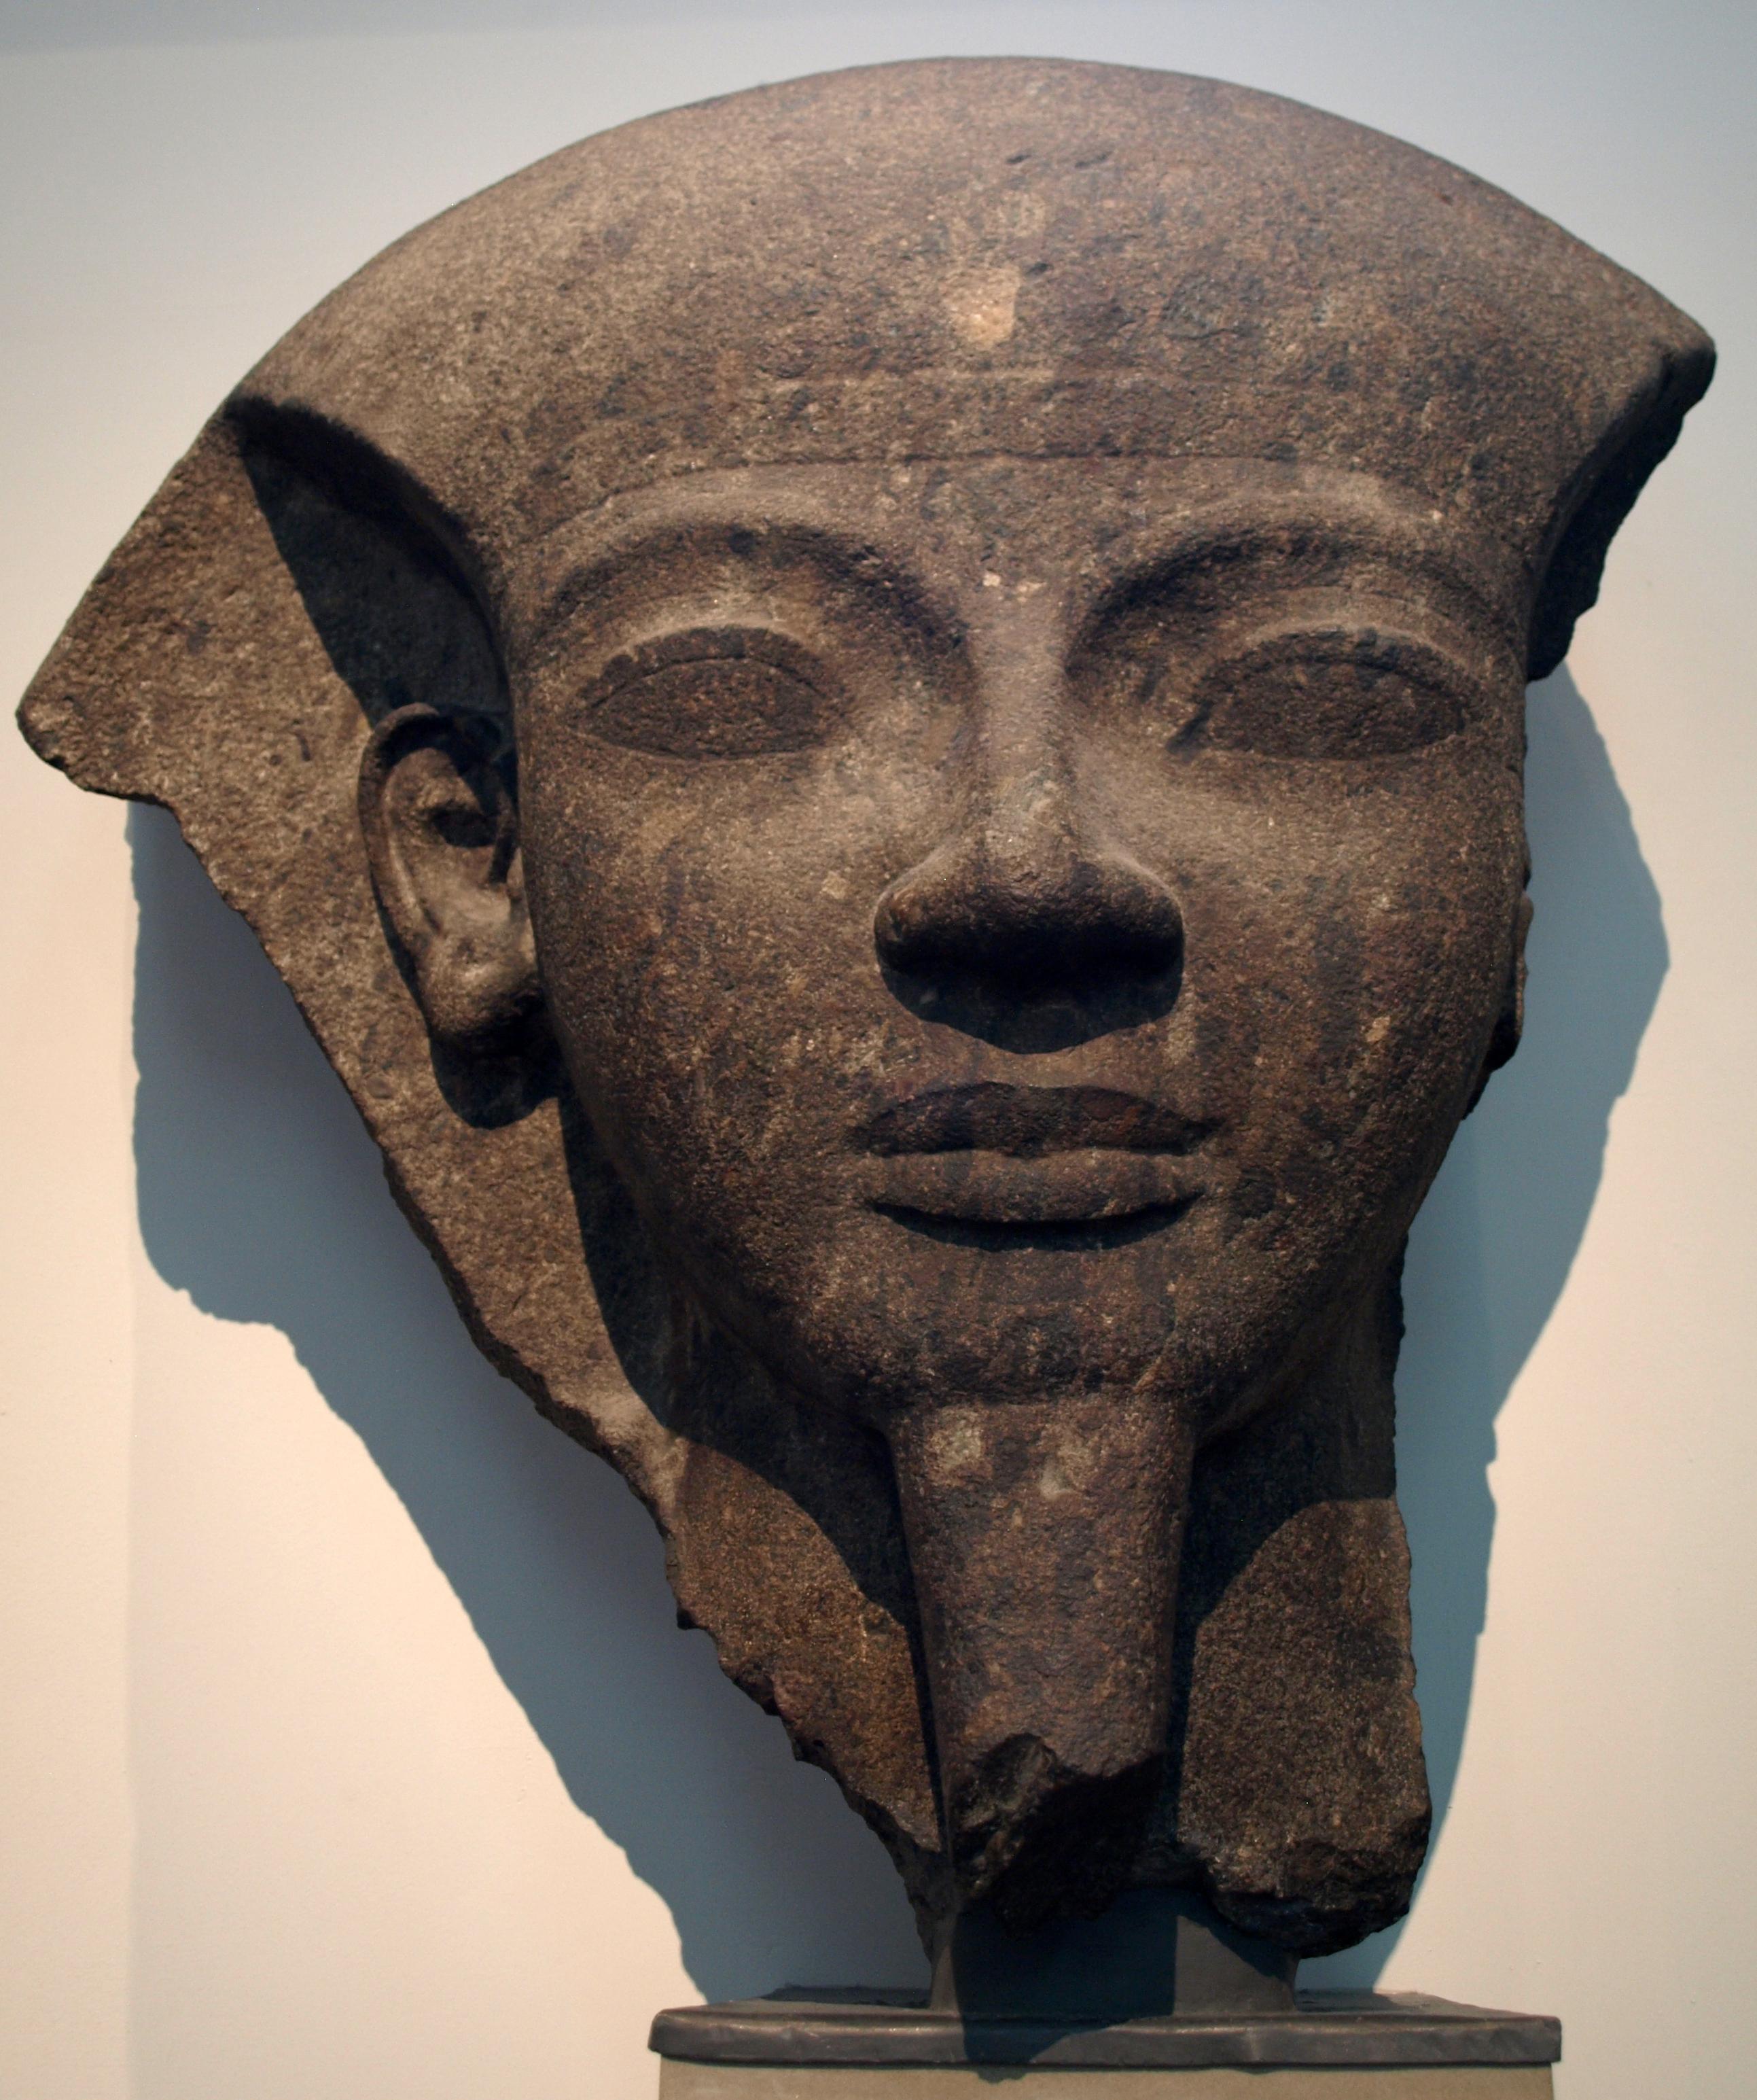 ramassesvifragmentarysarcophagushead-britishmuseum-august19-08.jpg